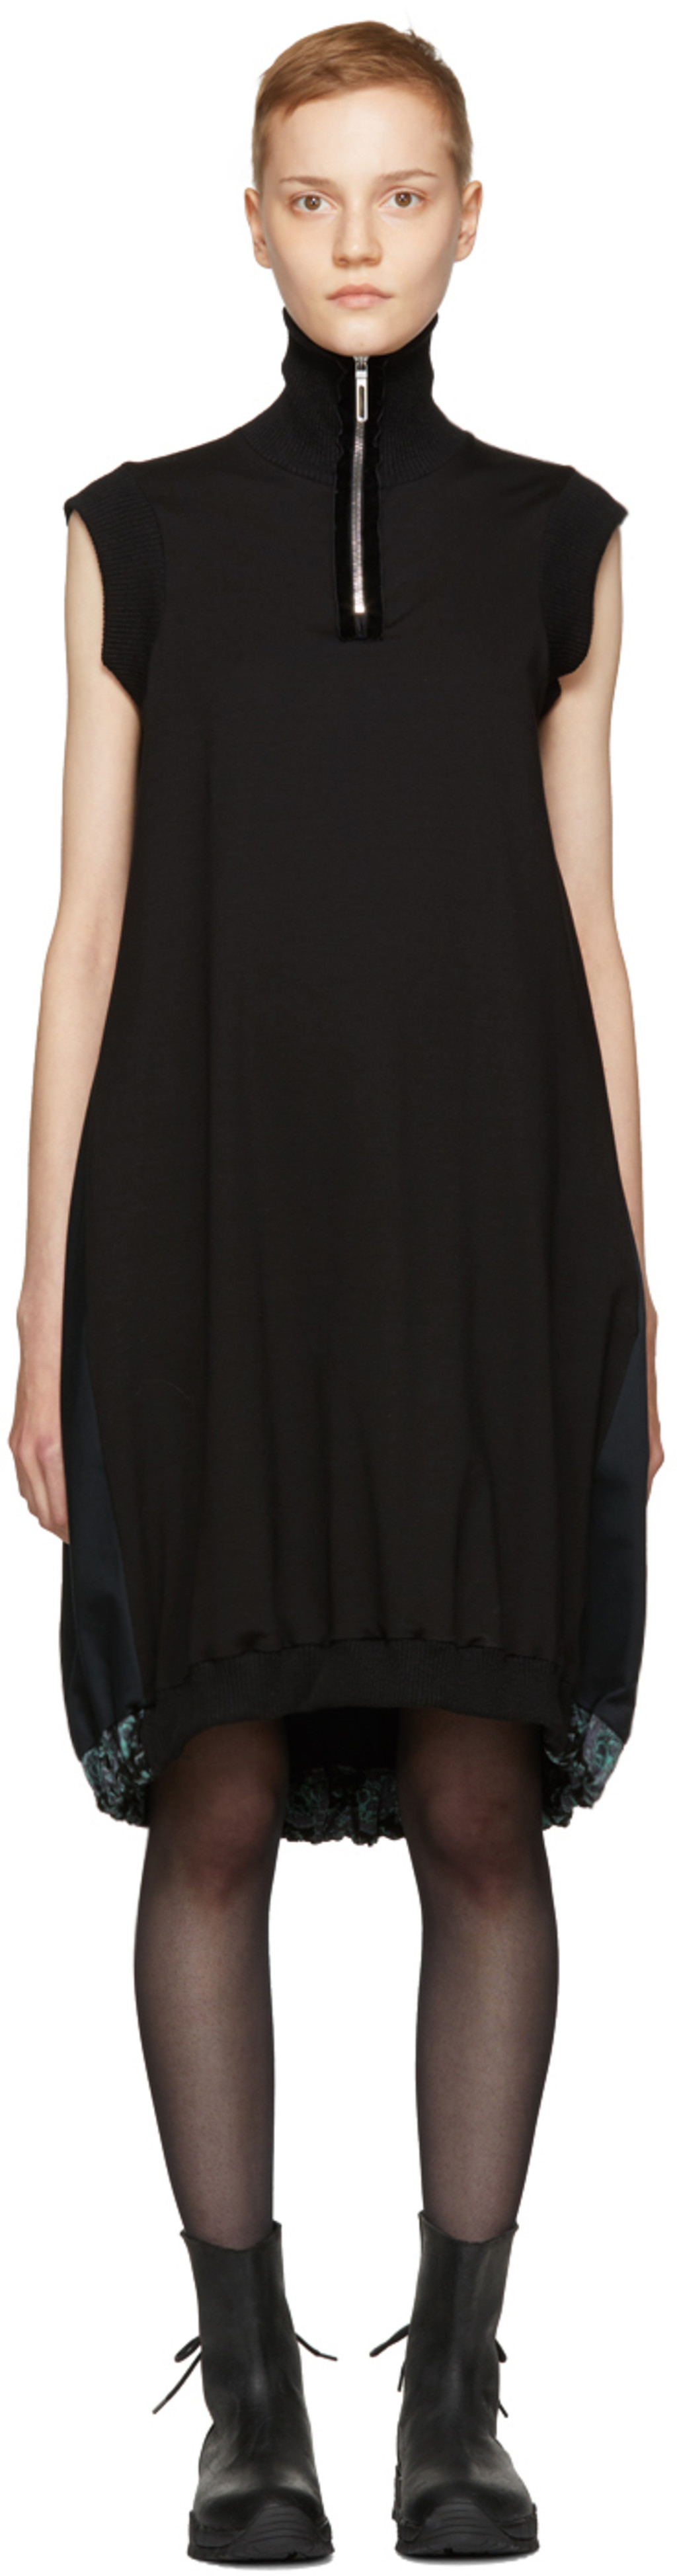 Black Forma Dress Ovelia Transtoto